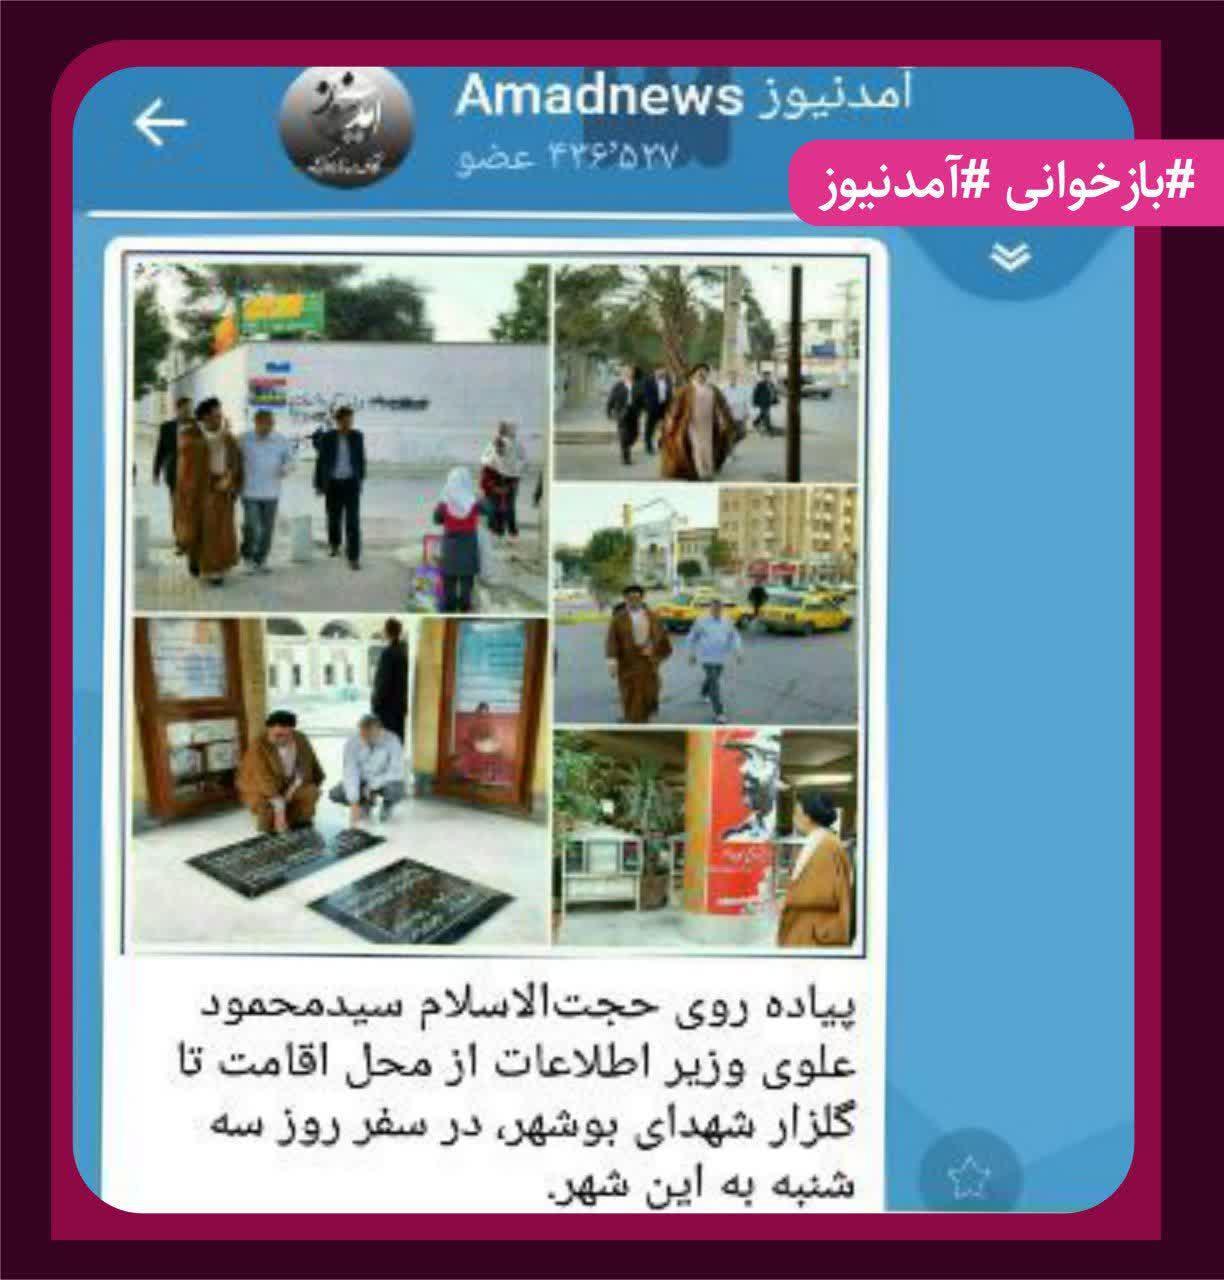 http://dl-abbasi.ir/yekta/1398/Graphic/Amadnews/amadnews%20(13).jpg